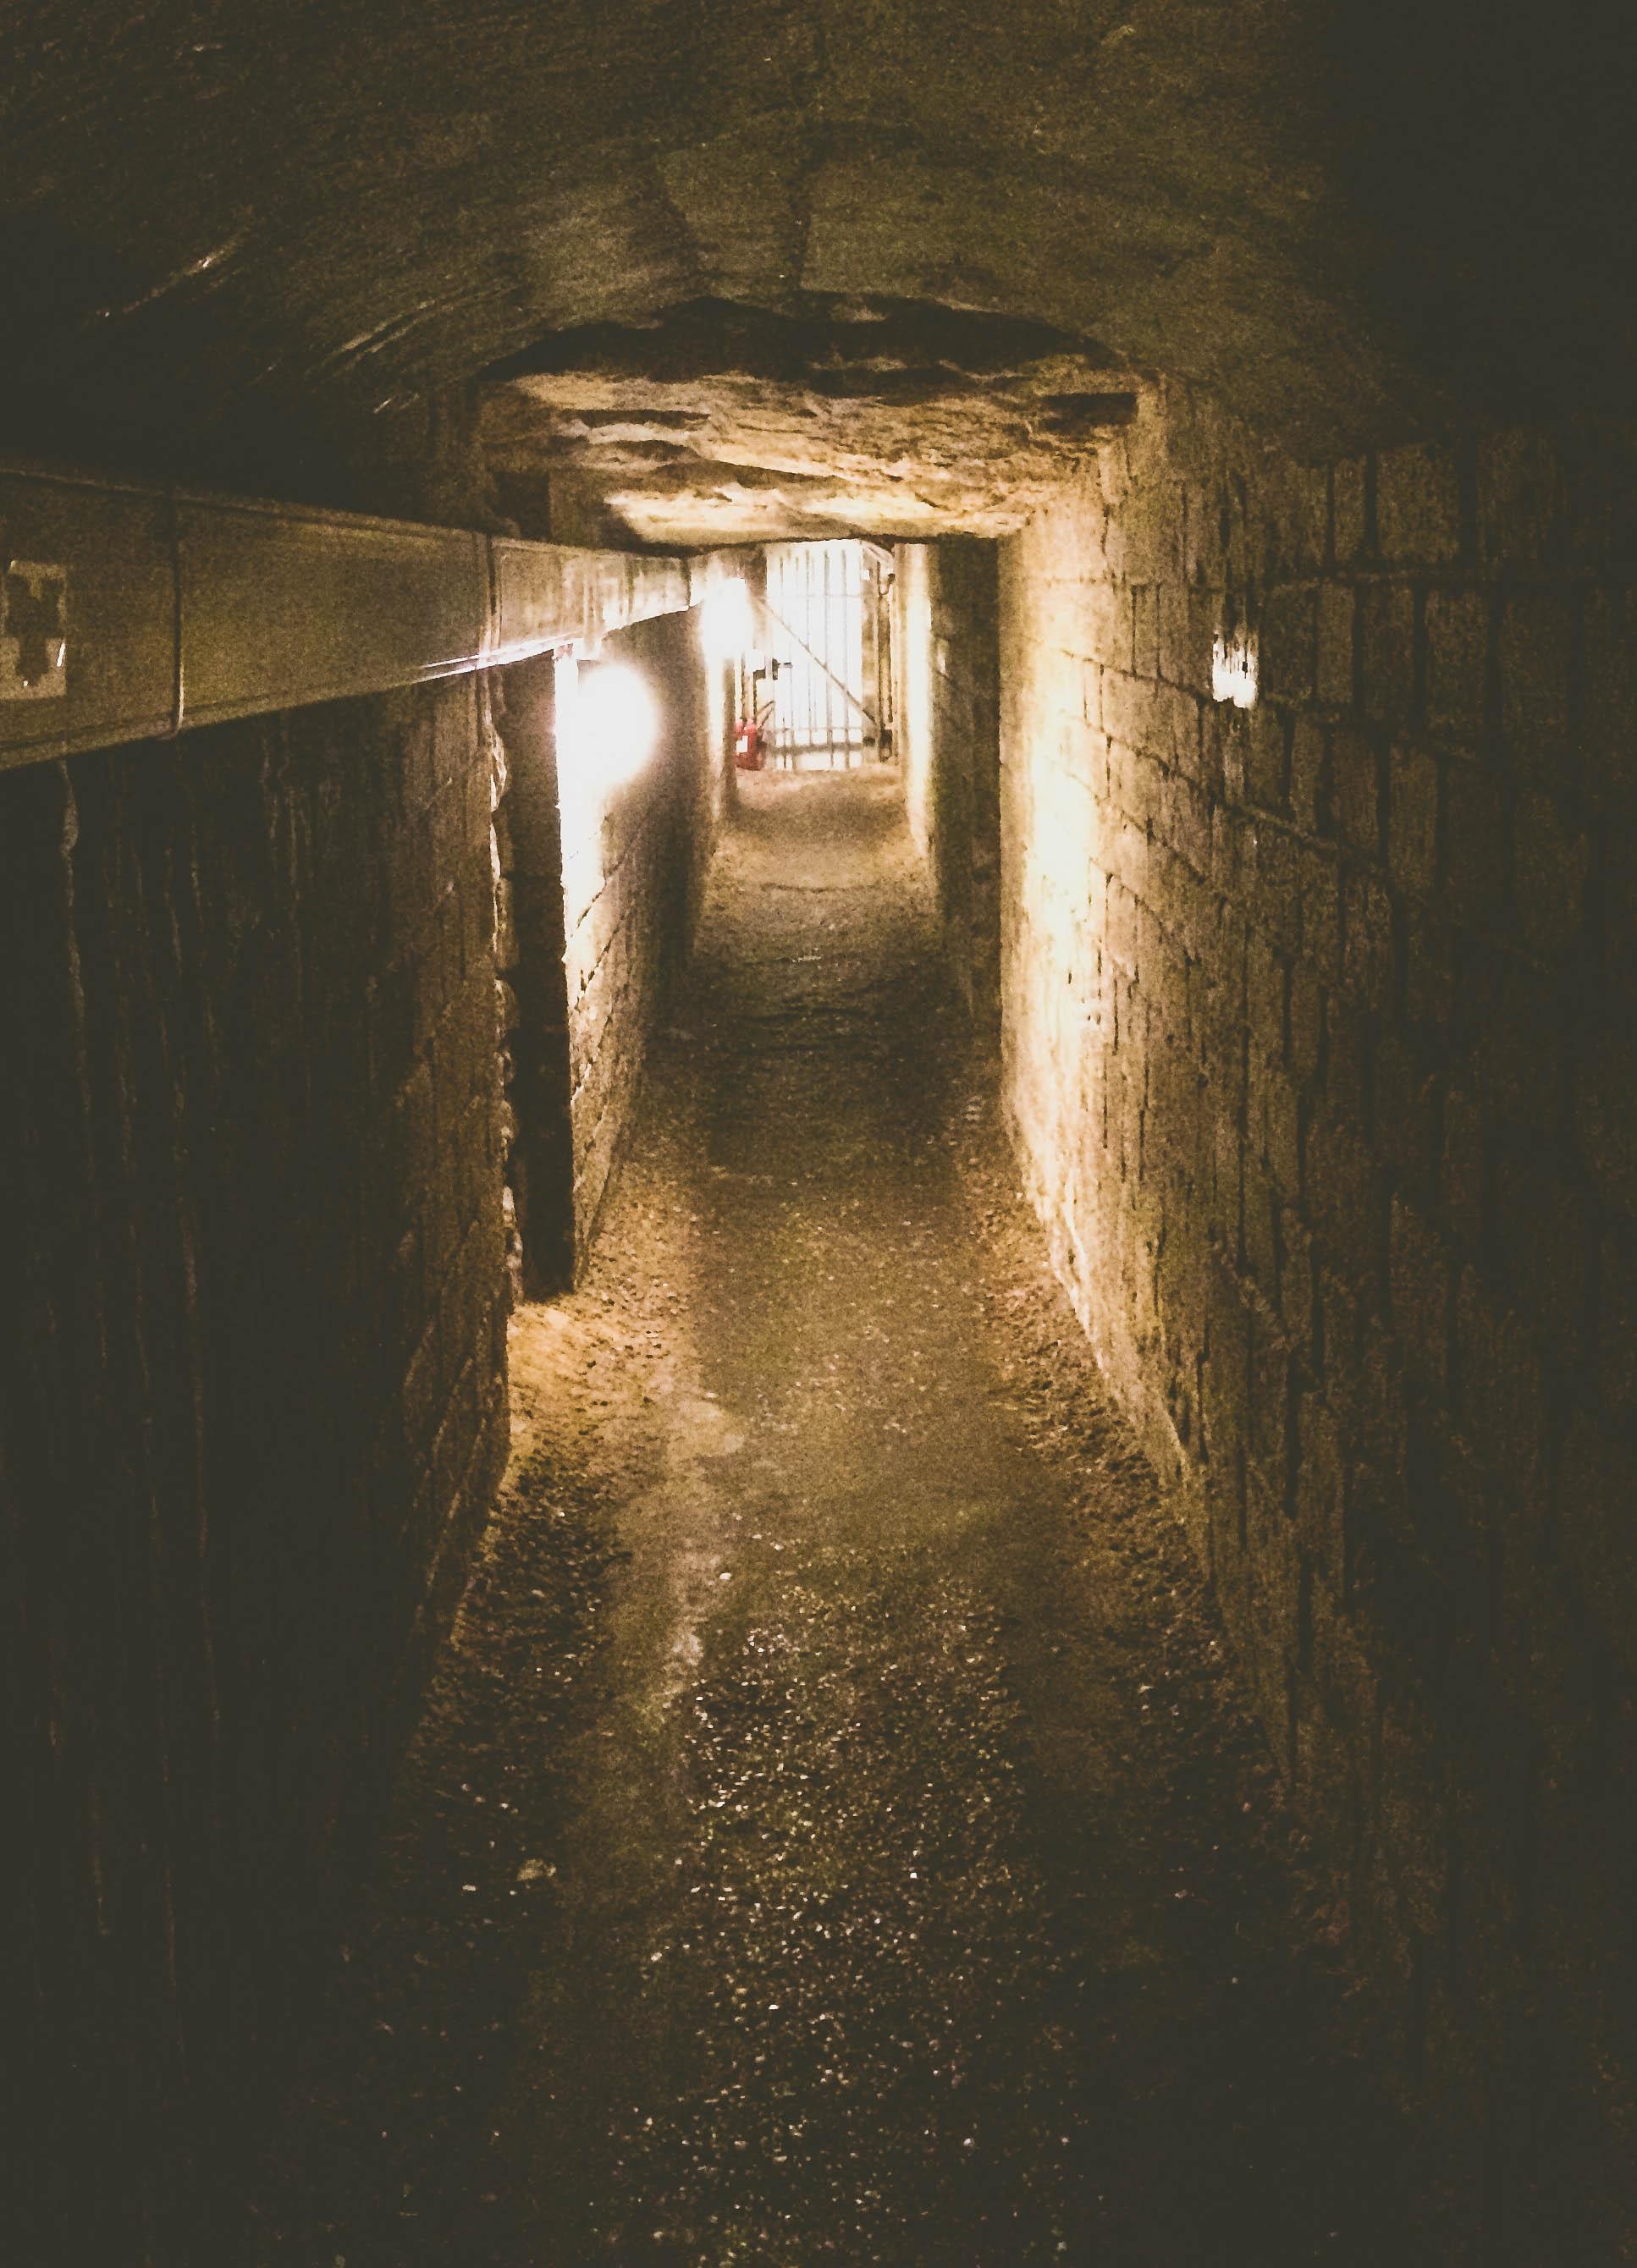 Following a long dark tunnel below the streets of Paris